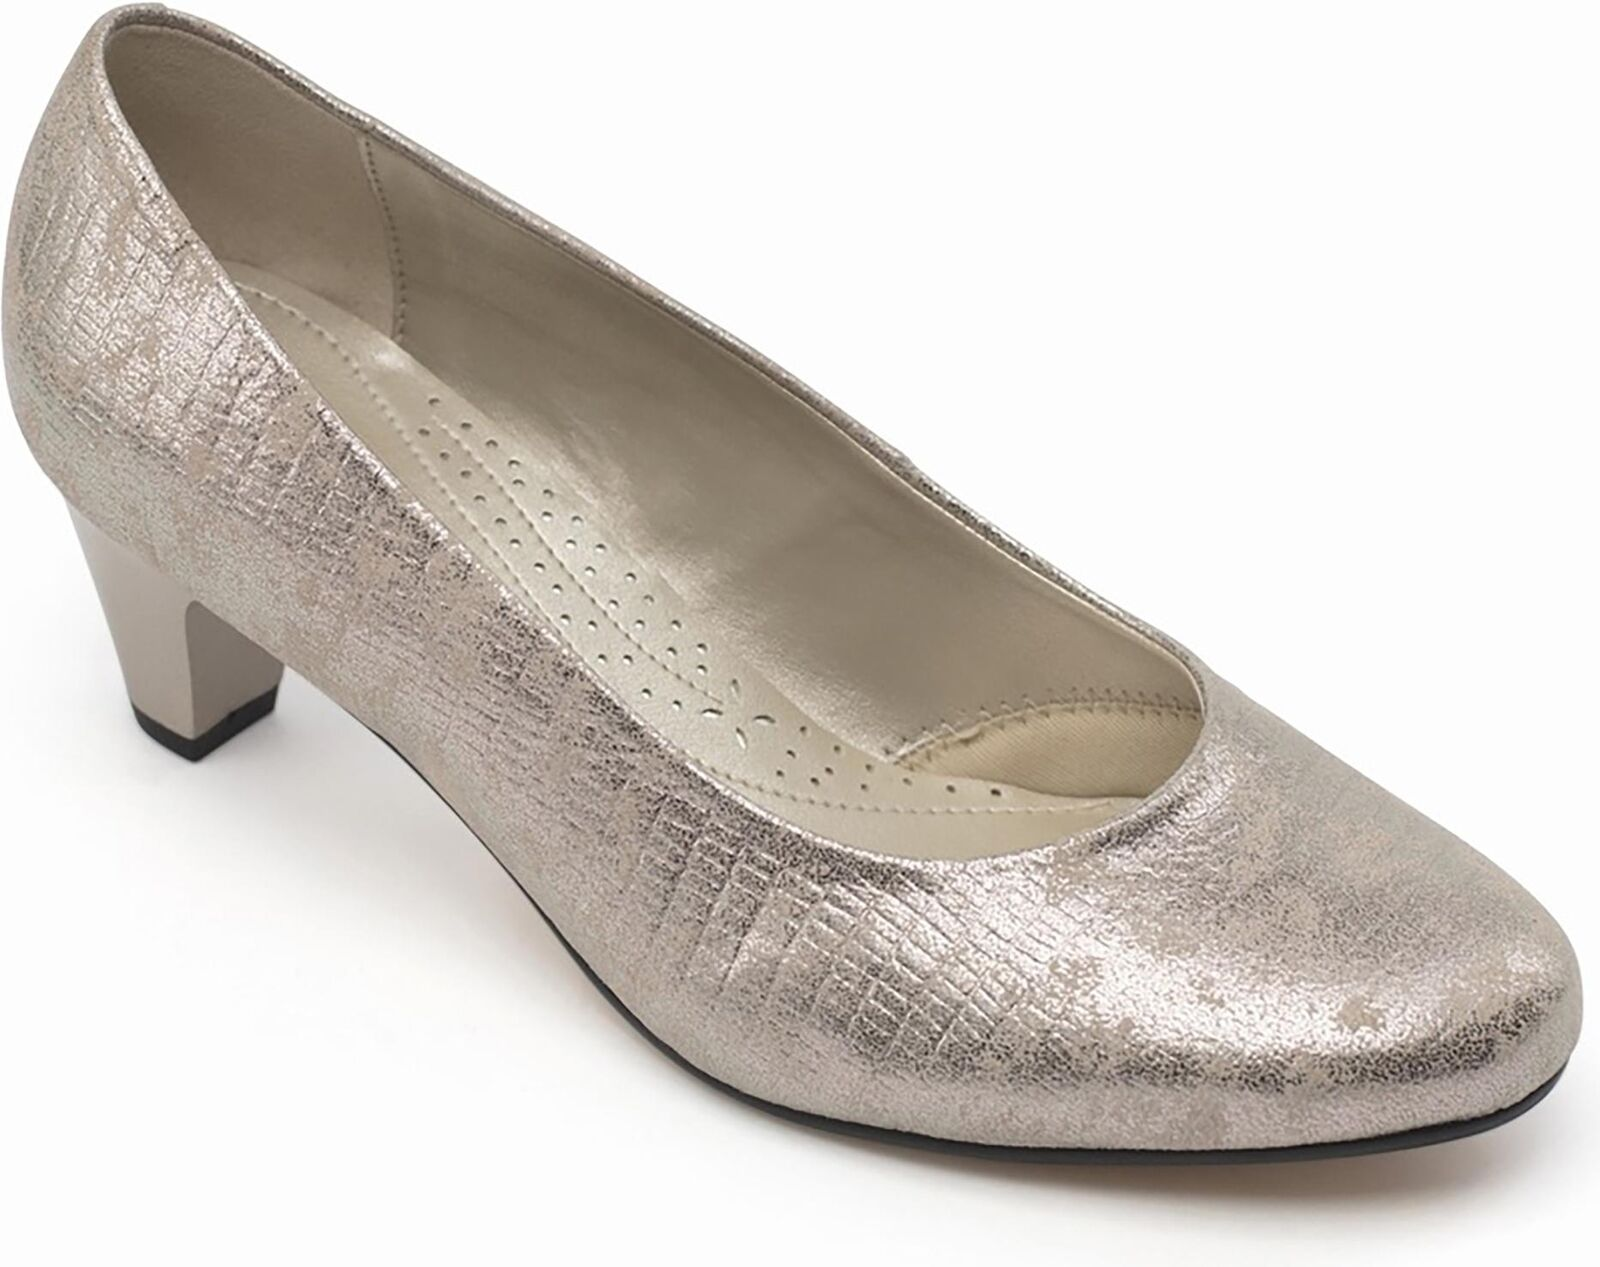 Padders Jane Femme Cuir Extra Large (2E) Cour Chaussures Métallique Reptile